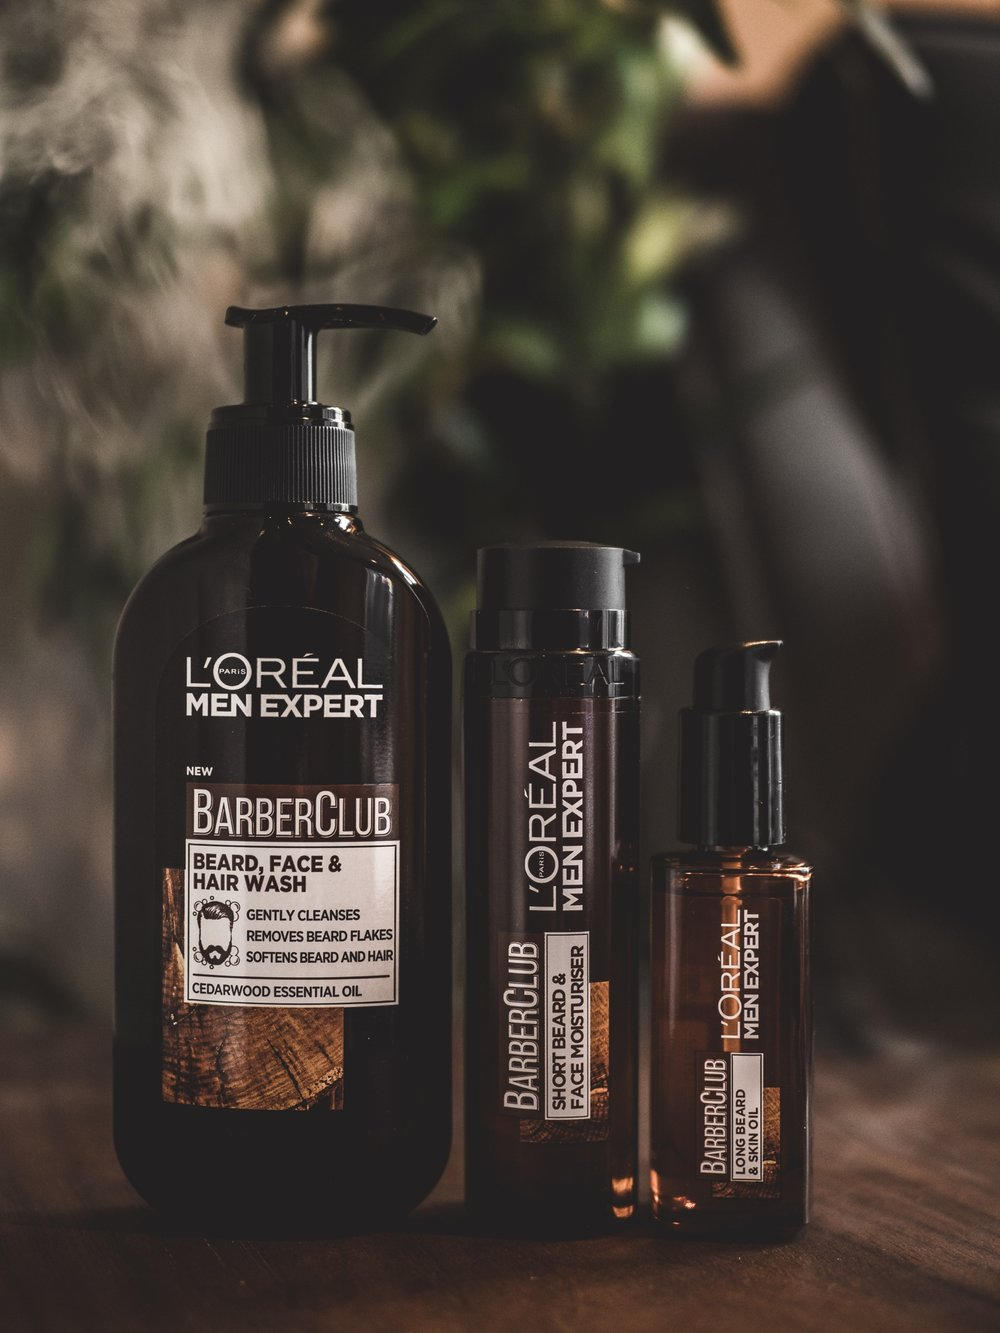 L'oreal Men Expert BarberClub Barber Club Grooming Products Beard Oil Moisturiser Face Hair Wash Short Long